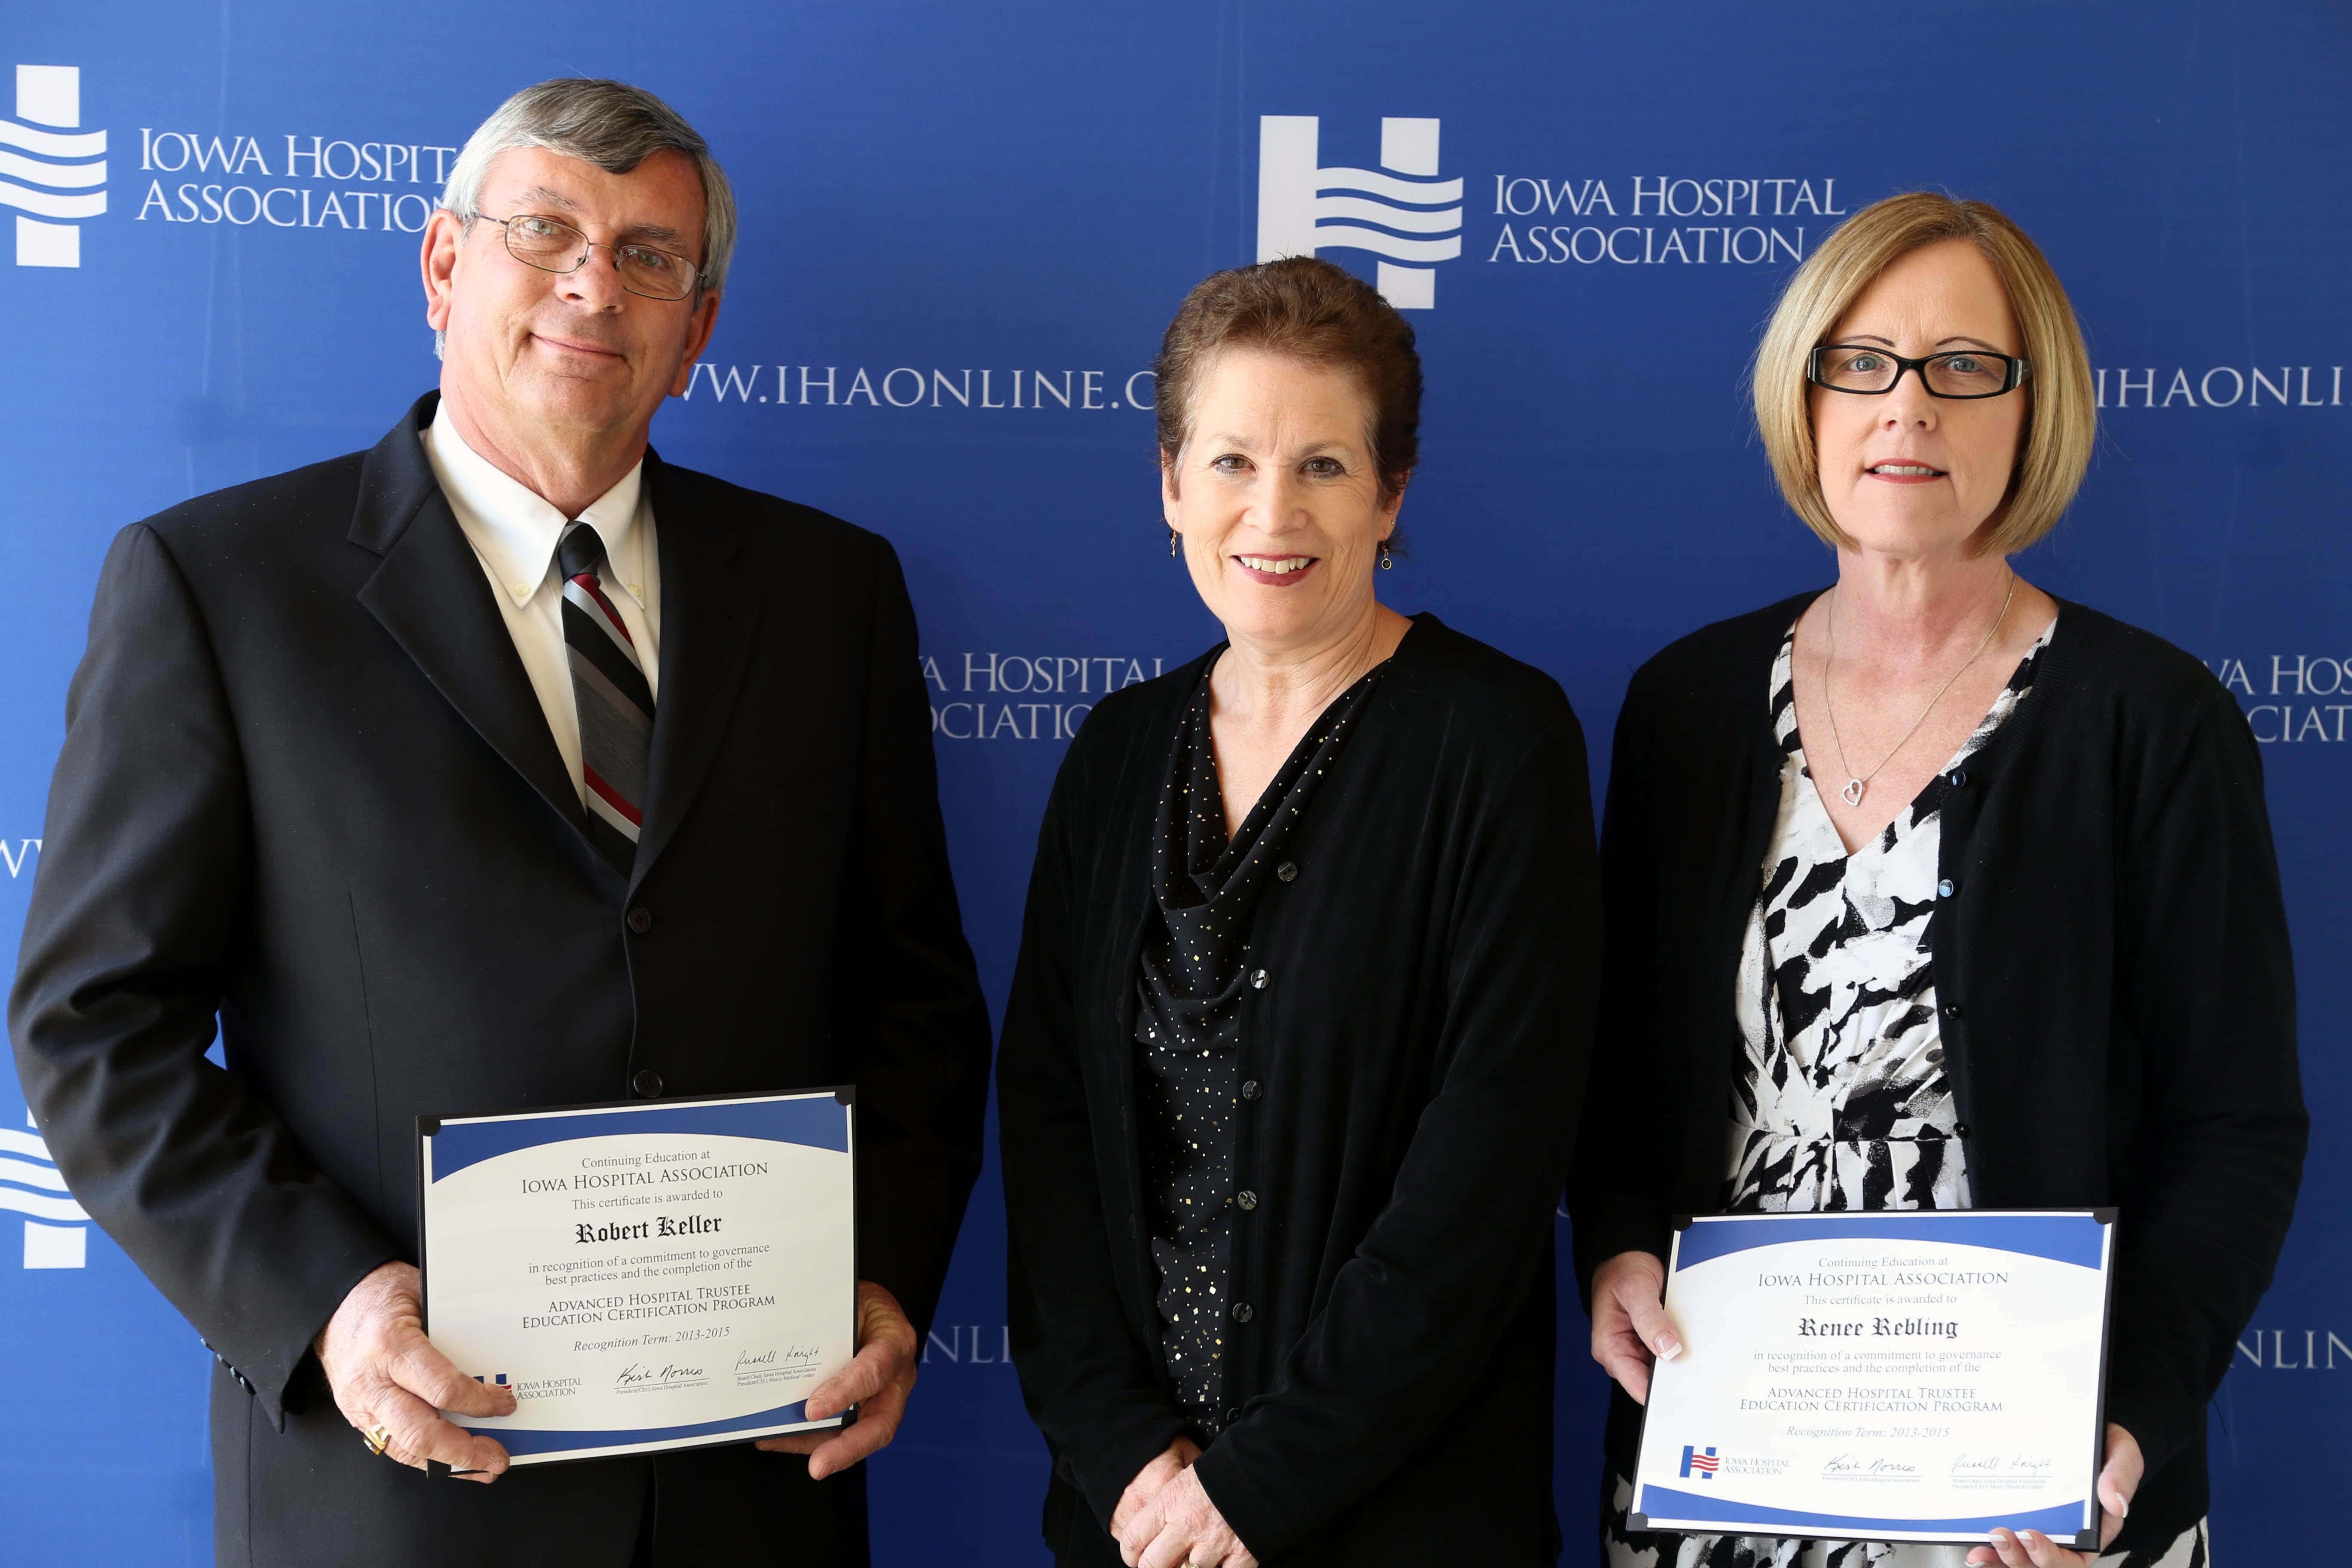 IHA Certificate Award